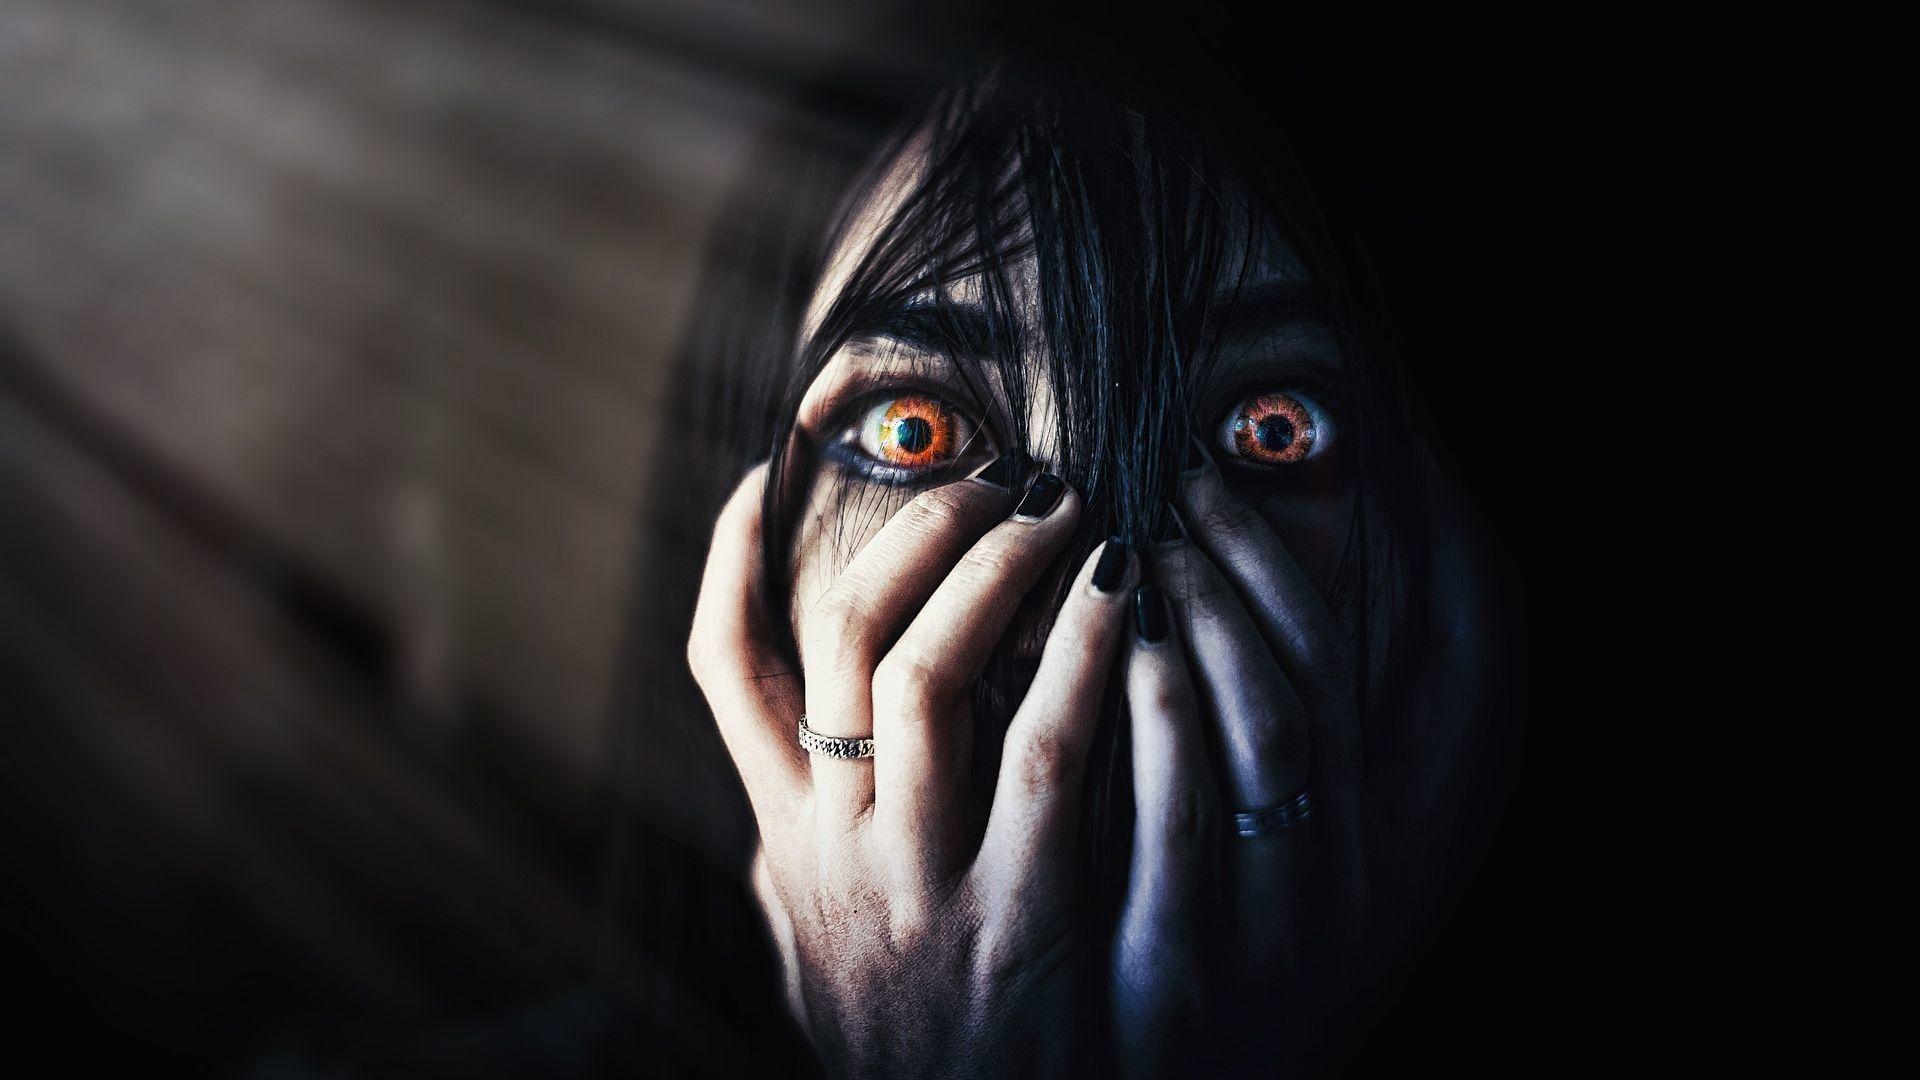 Inspirational Horror Desktop Wallpaper